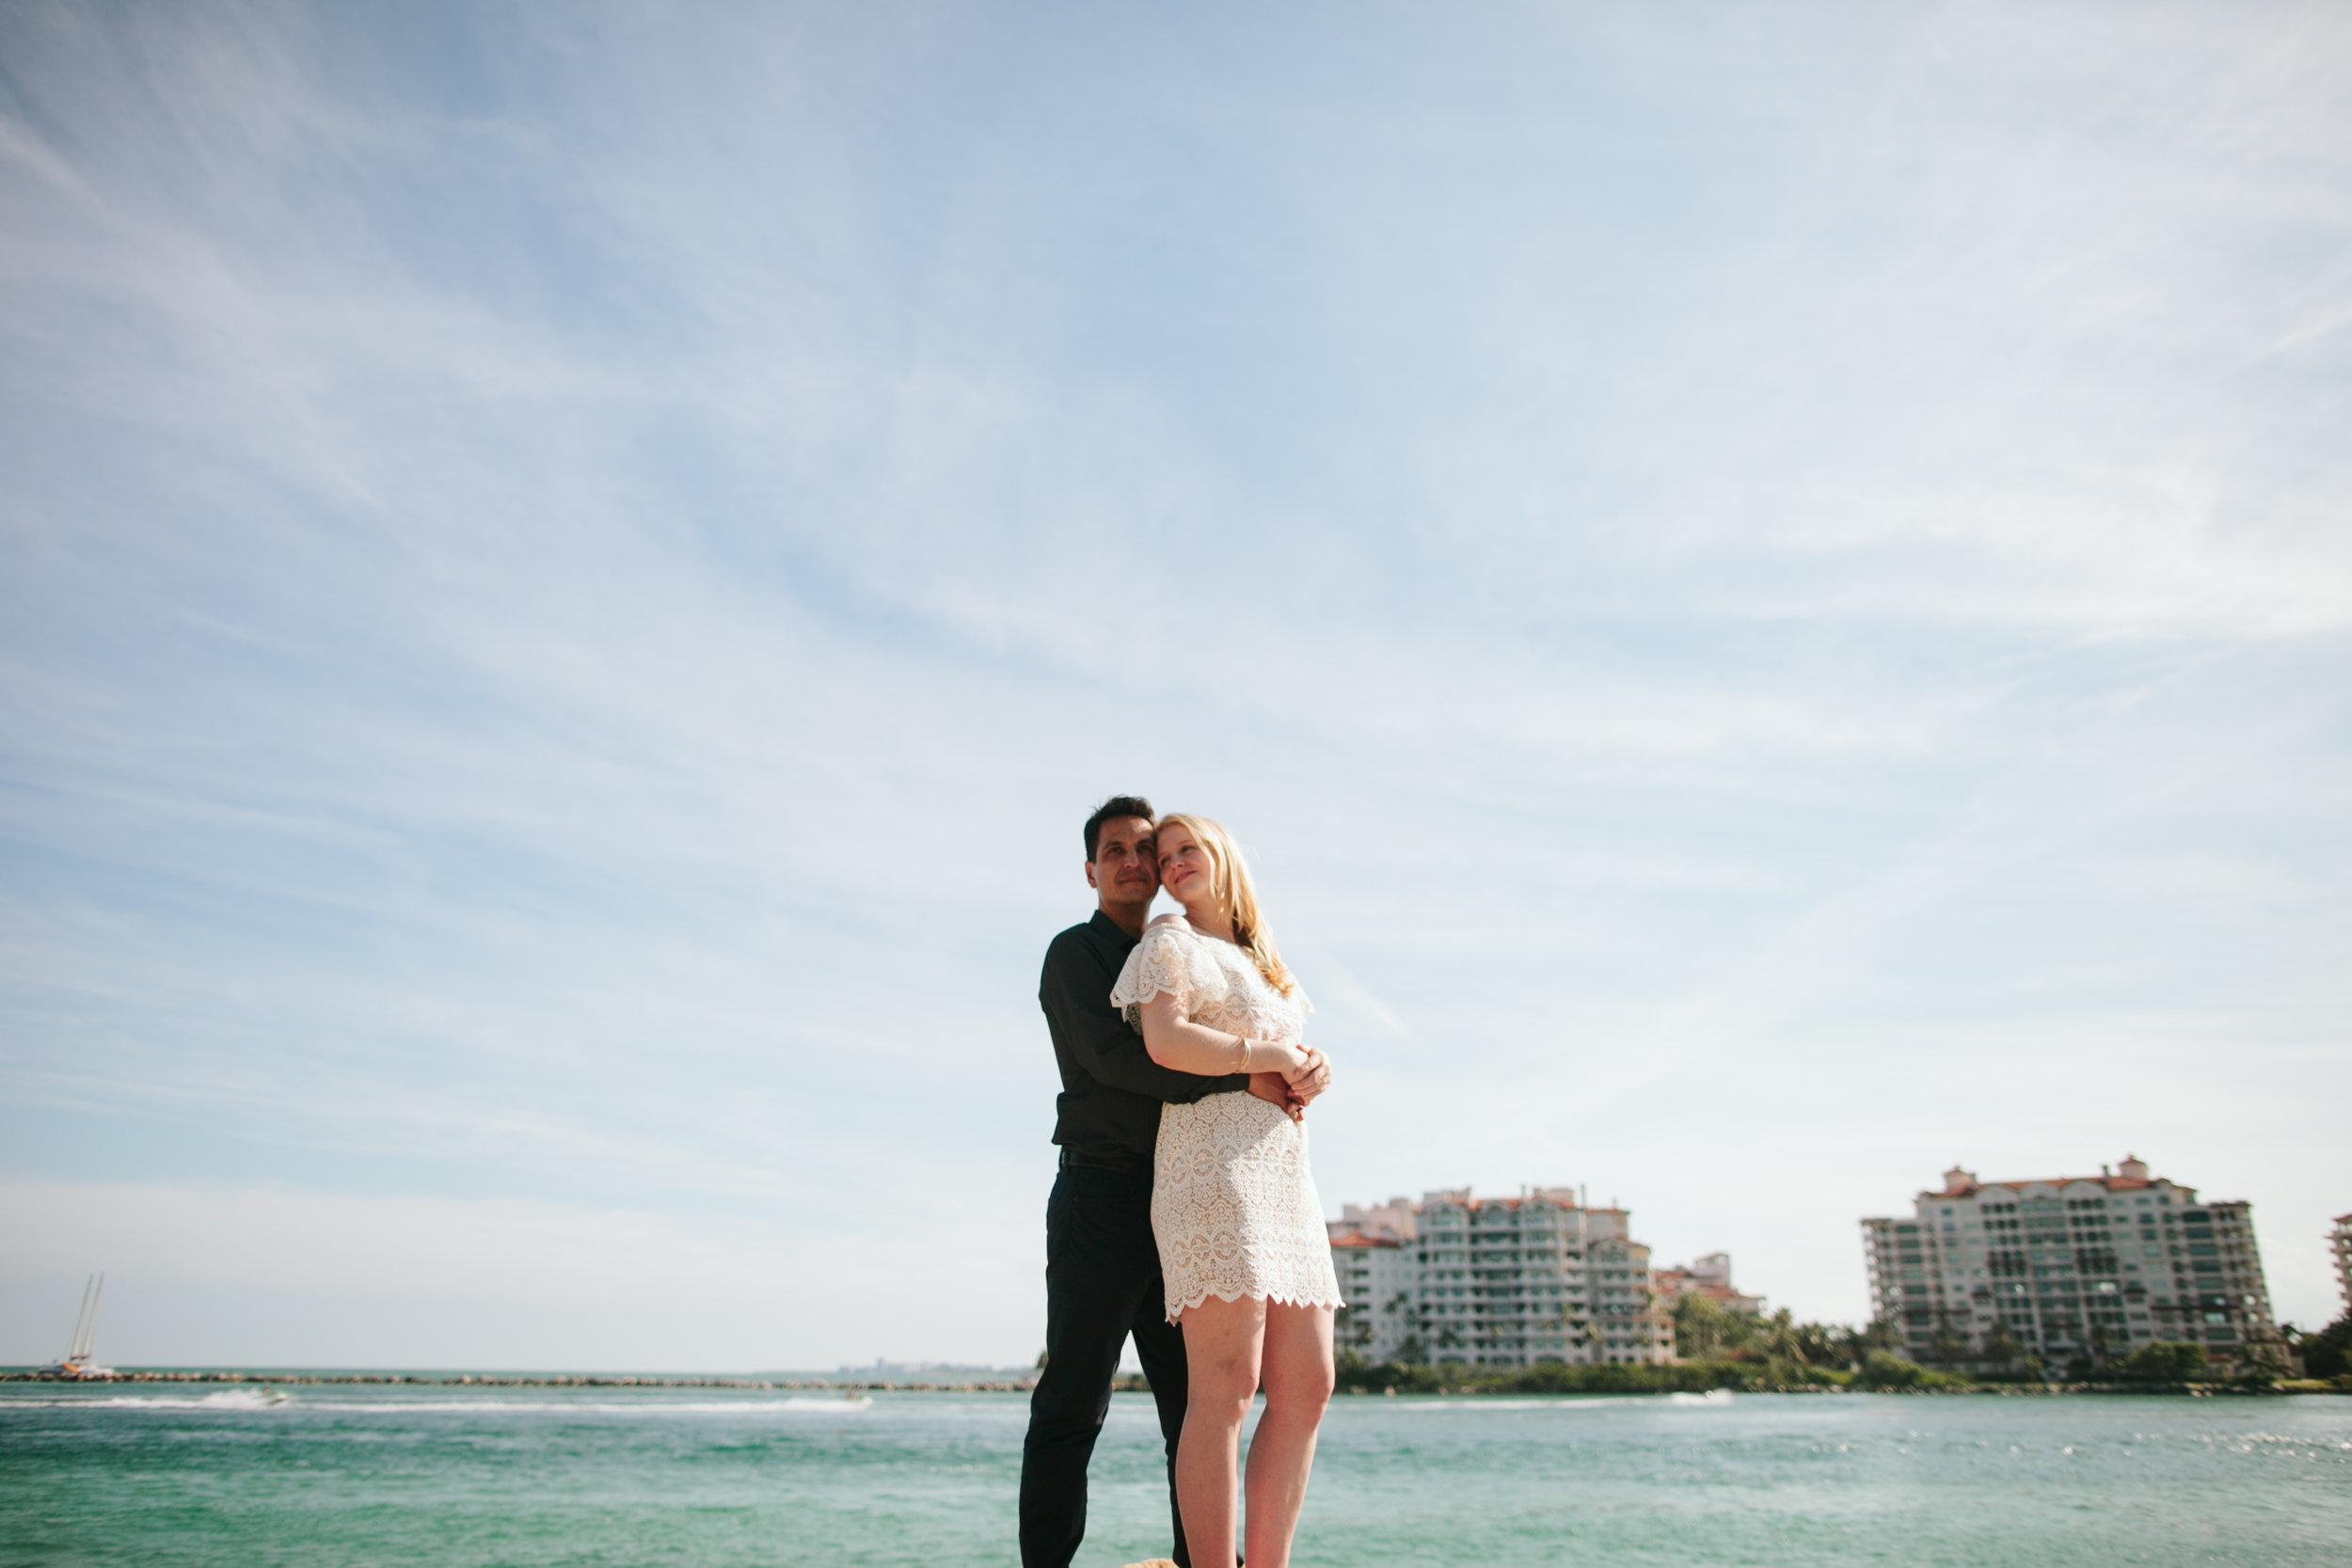 Miami Beach Engagement at South Pointe Park (23).jpg